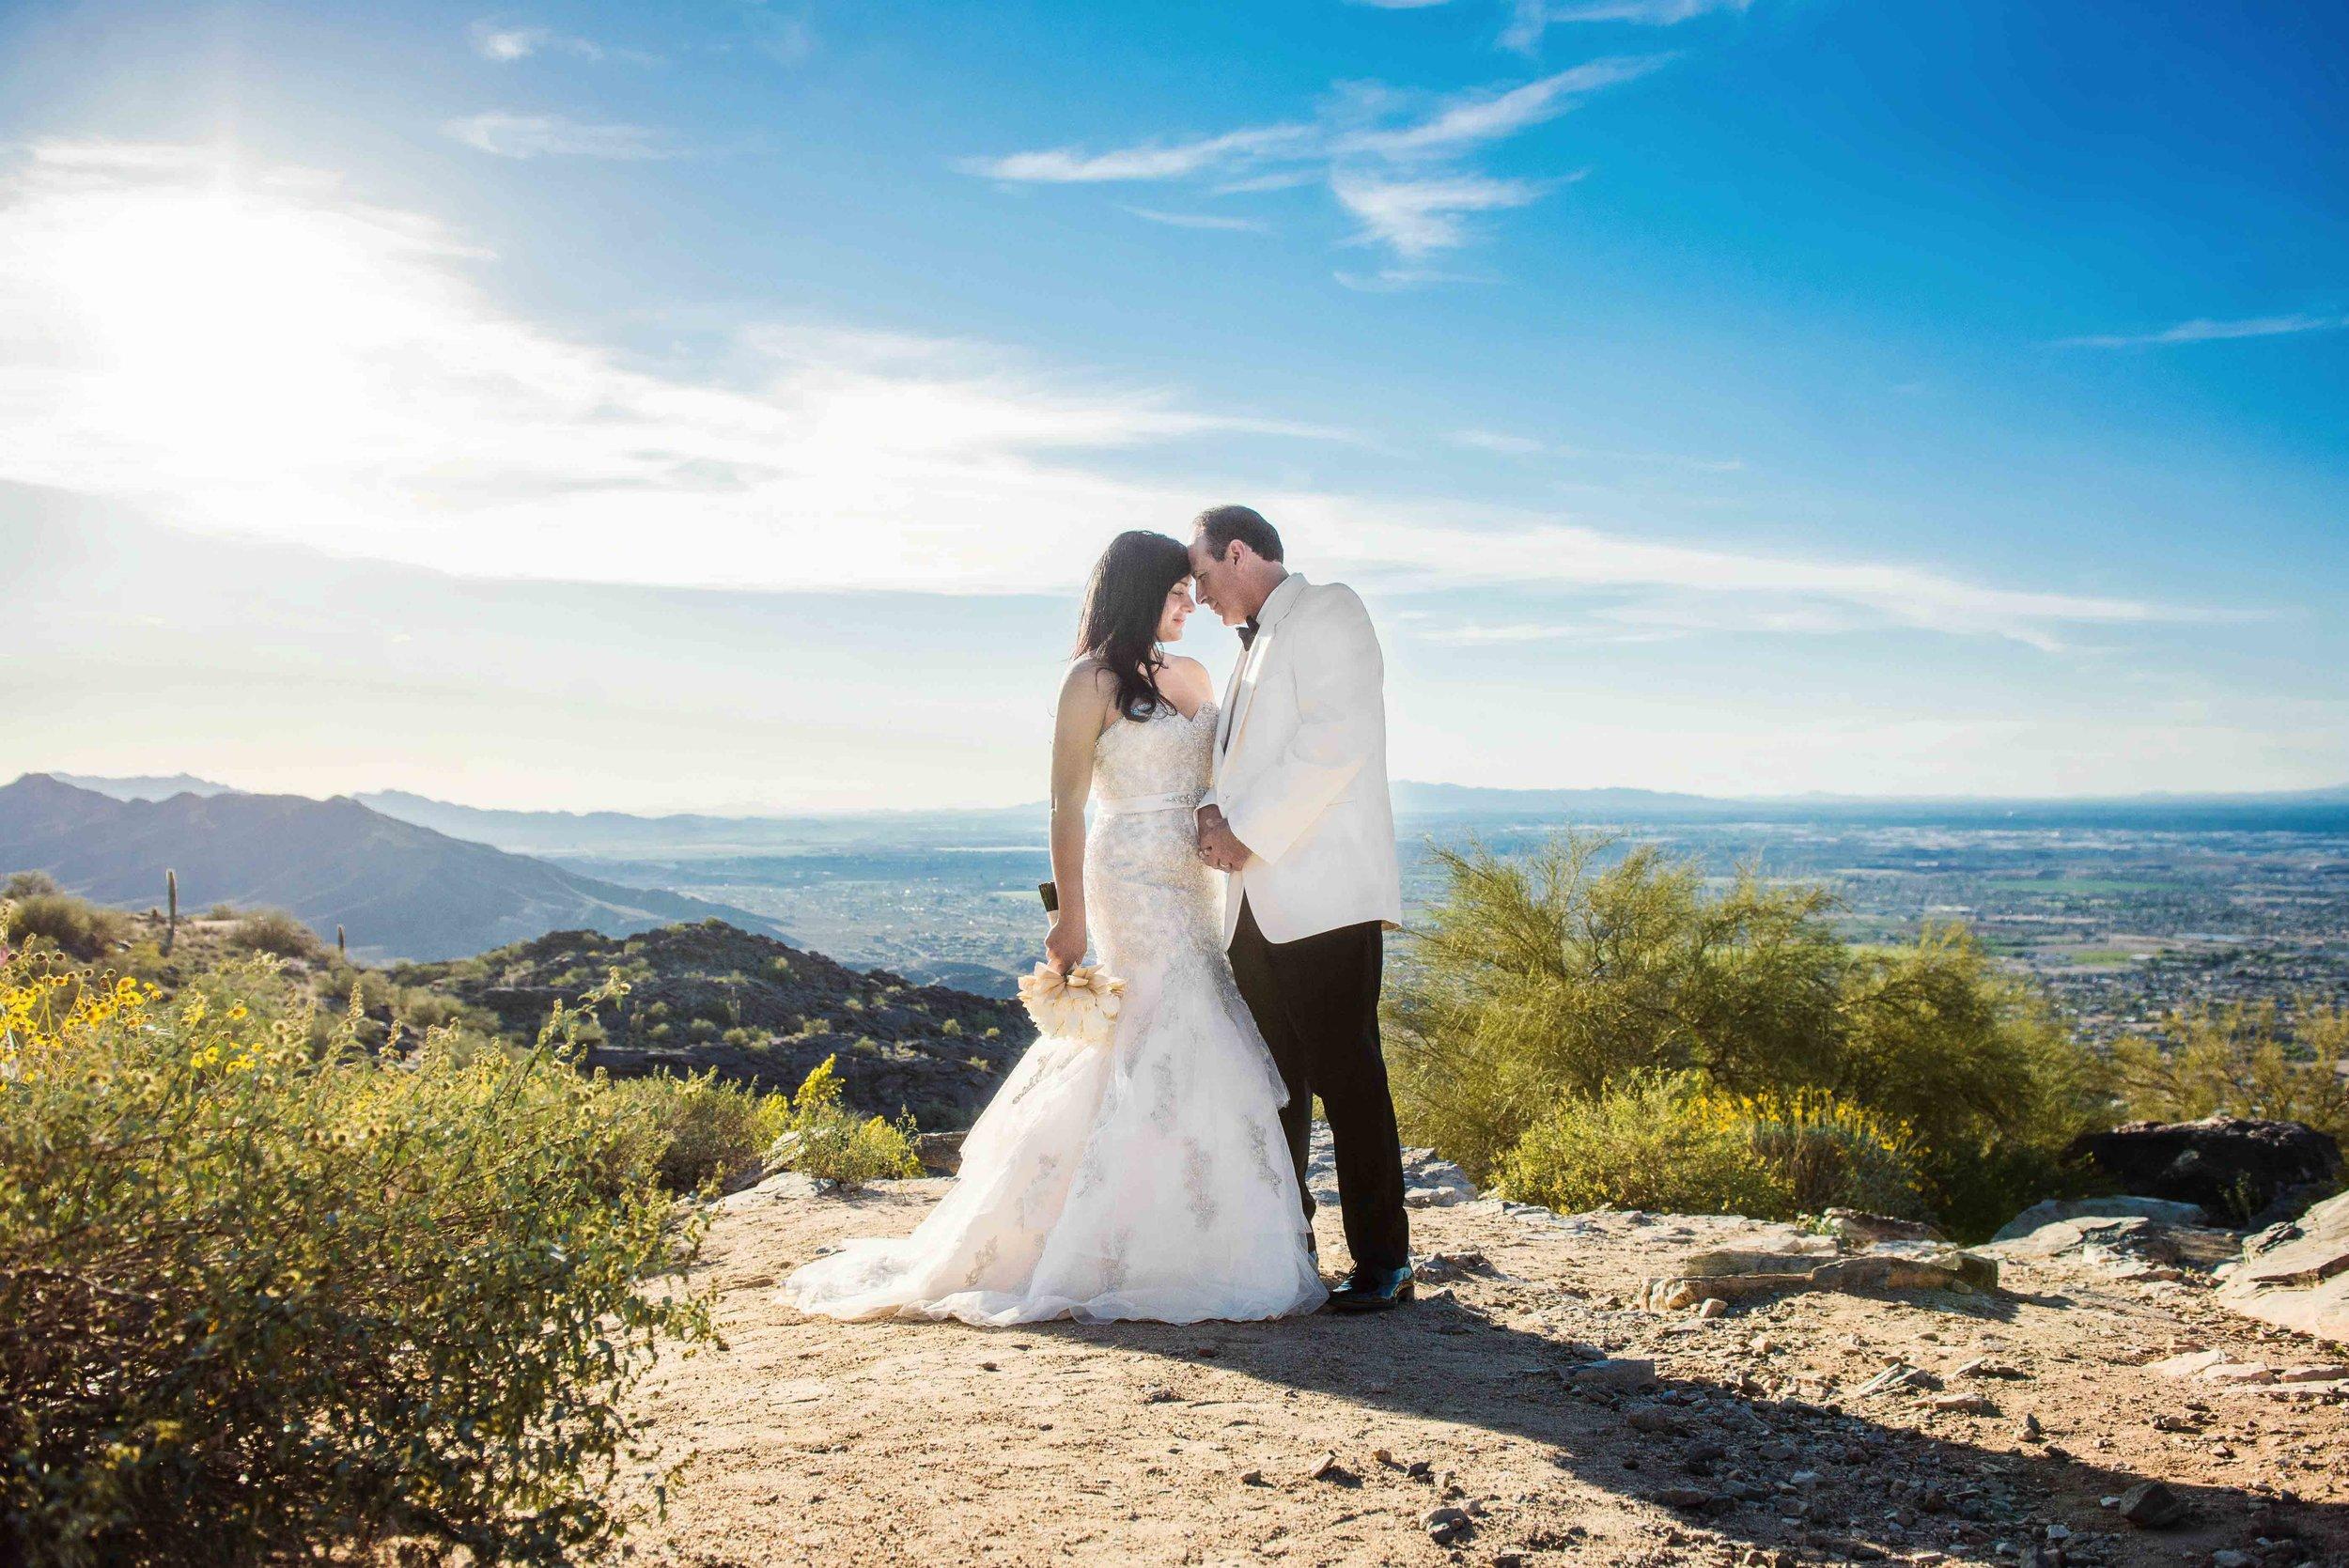 weddingwebsitesmallerpics-241.jpg